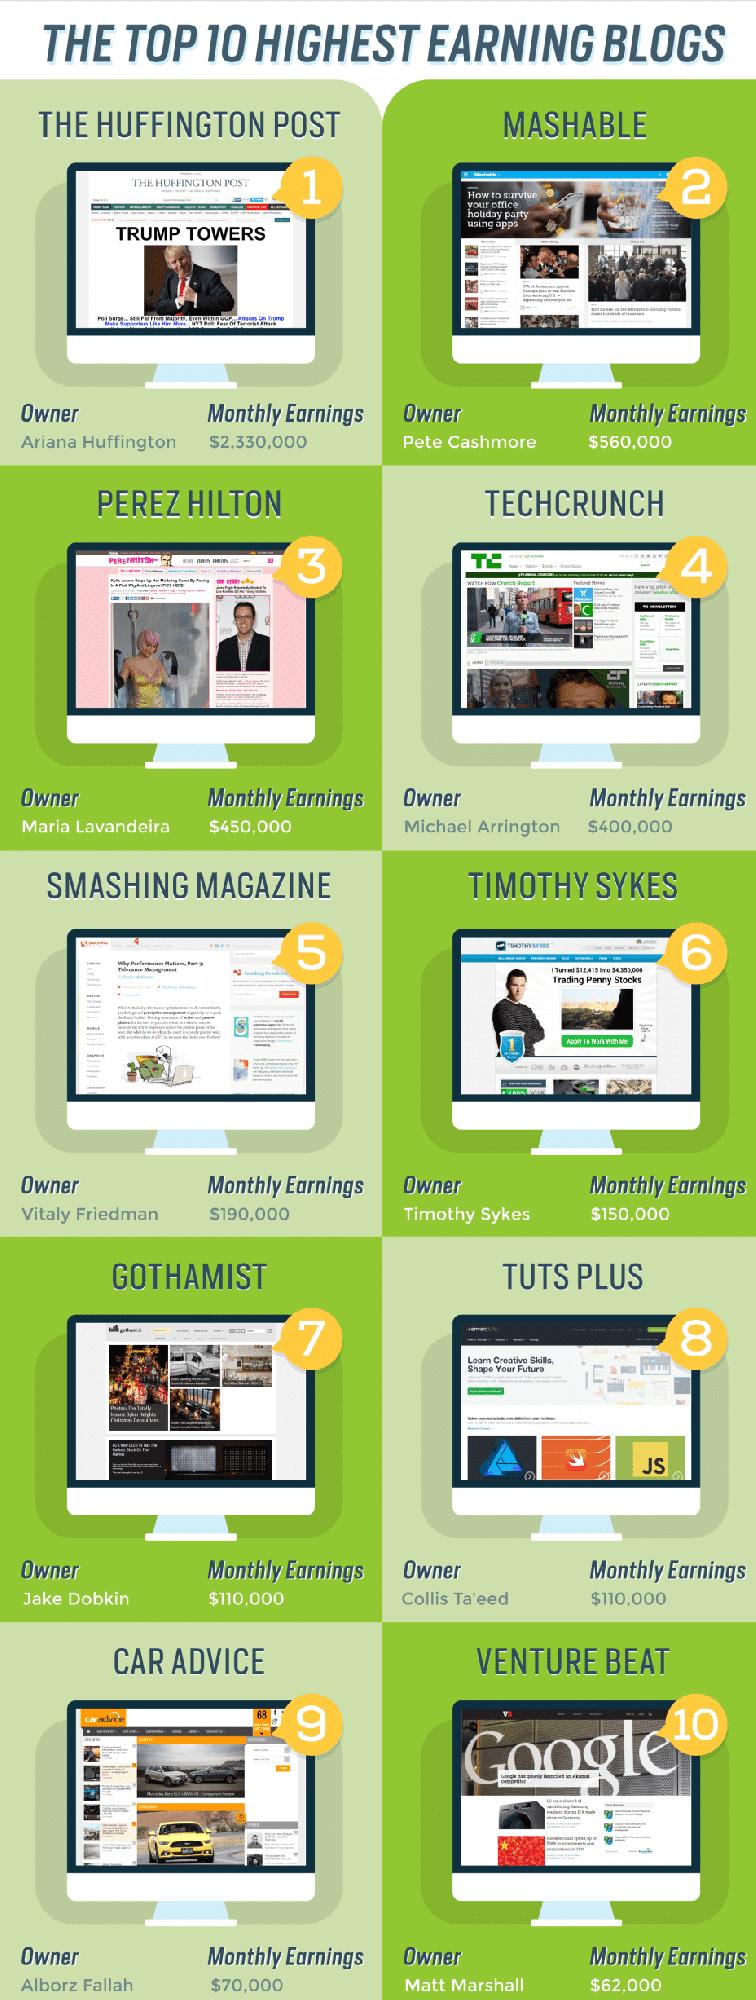 Top-Earning-Blogs